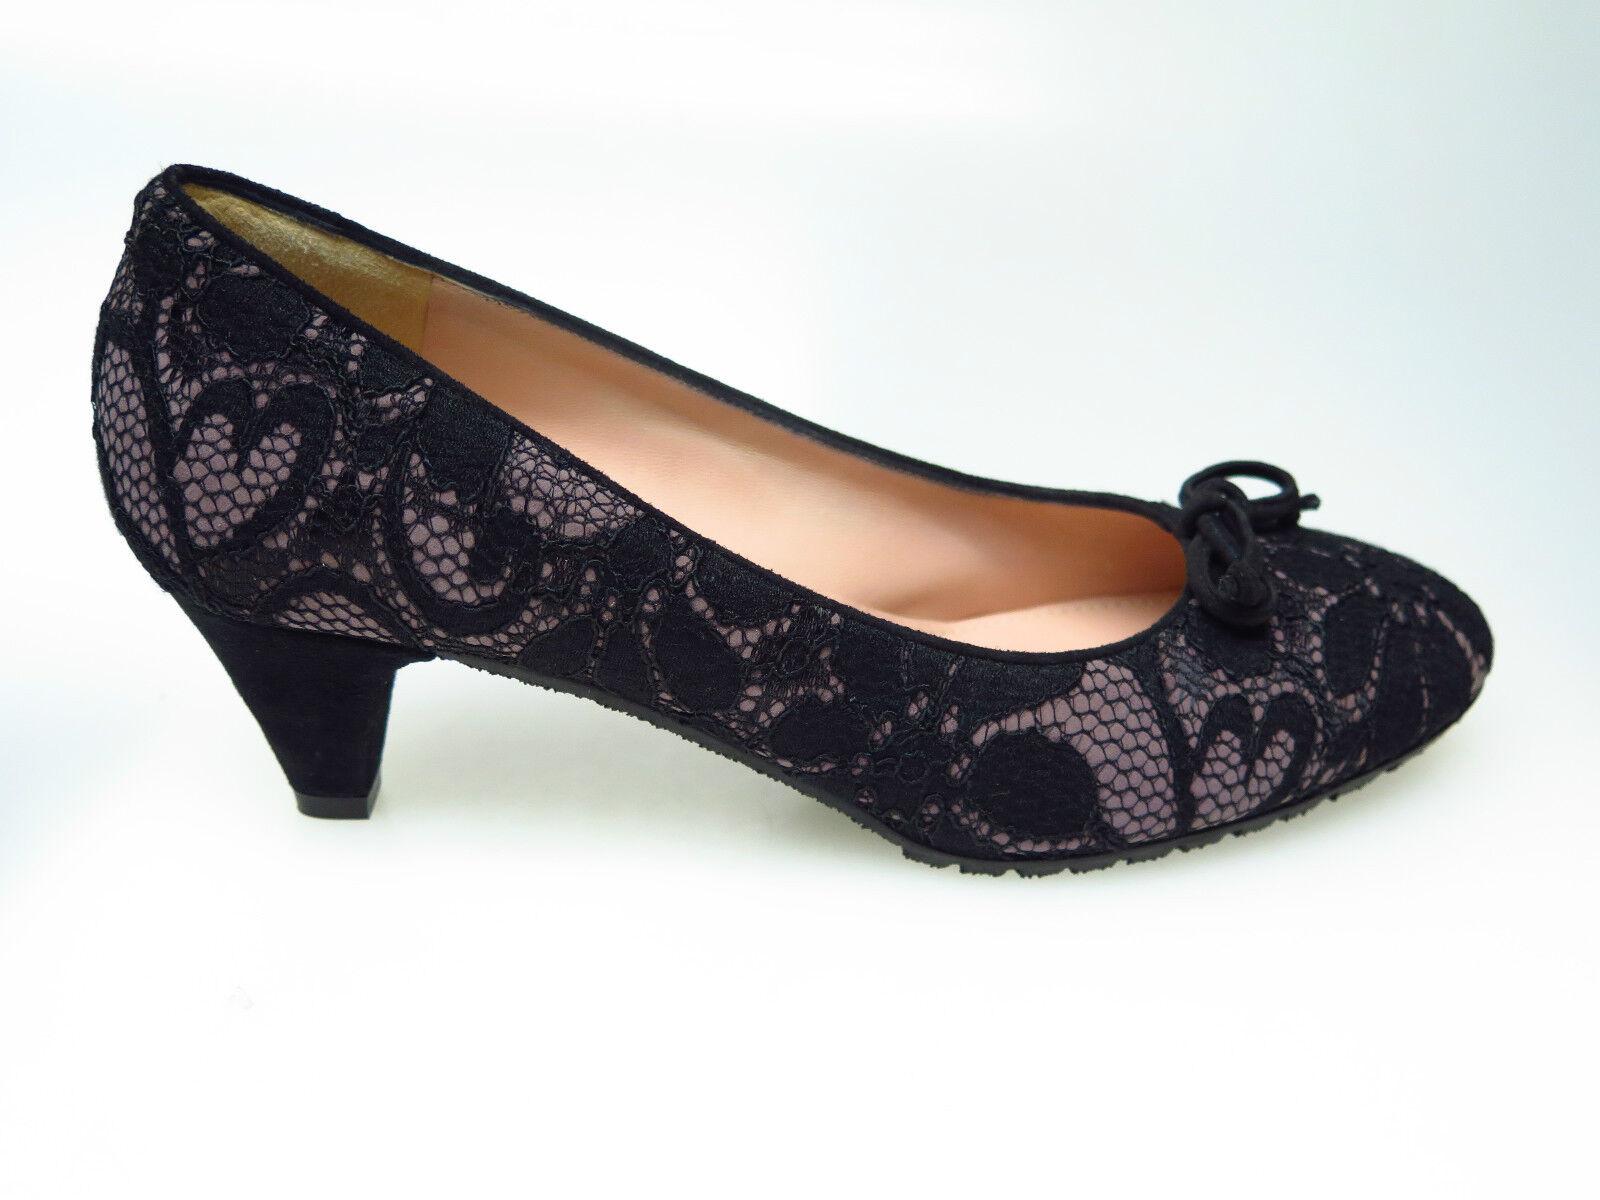 SULTANA Schuhe Designer Designer Designer Damenschuhe N3684 Gaga Florencia Nero Gr. 39,5 NEU 312060